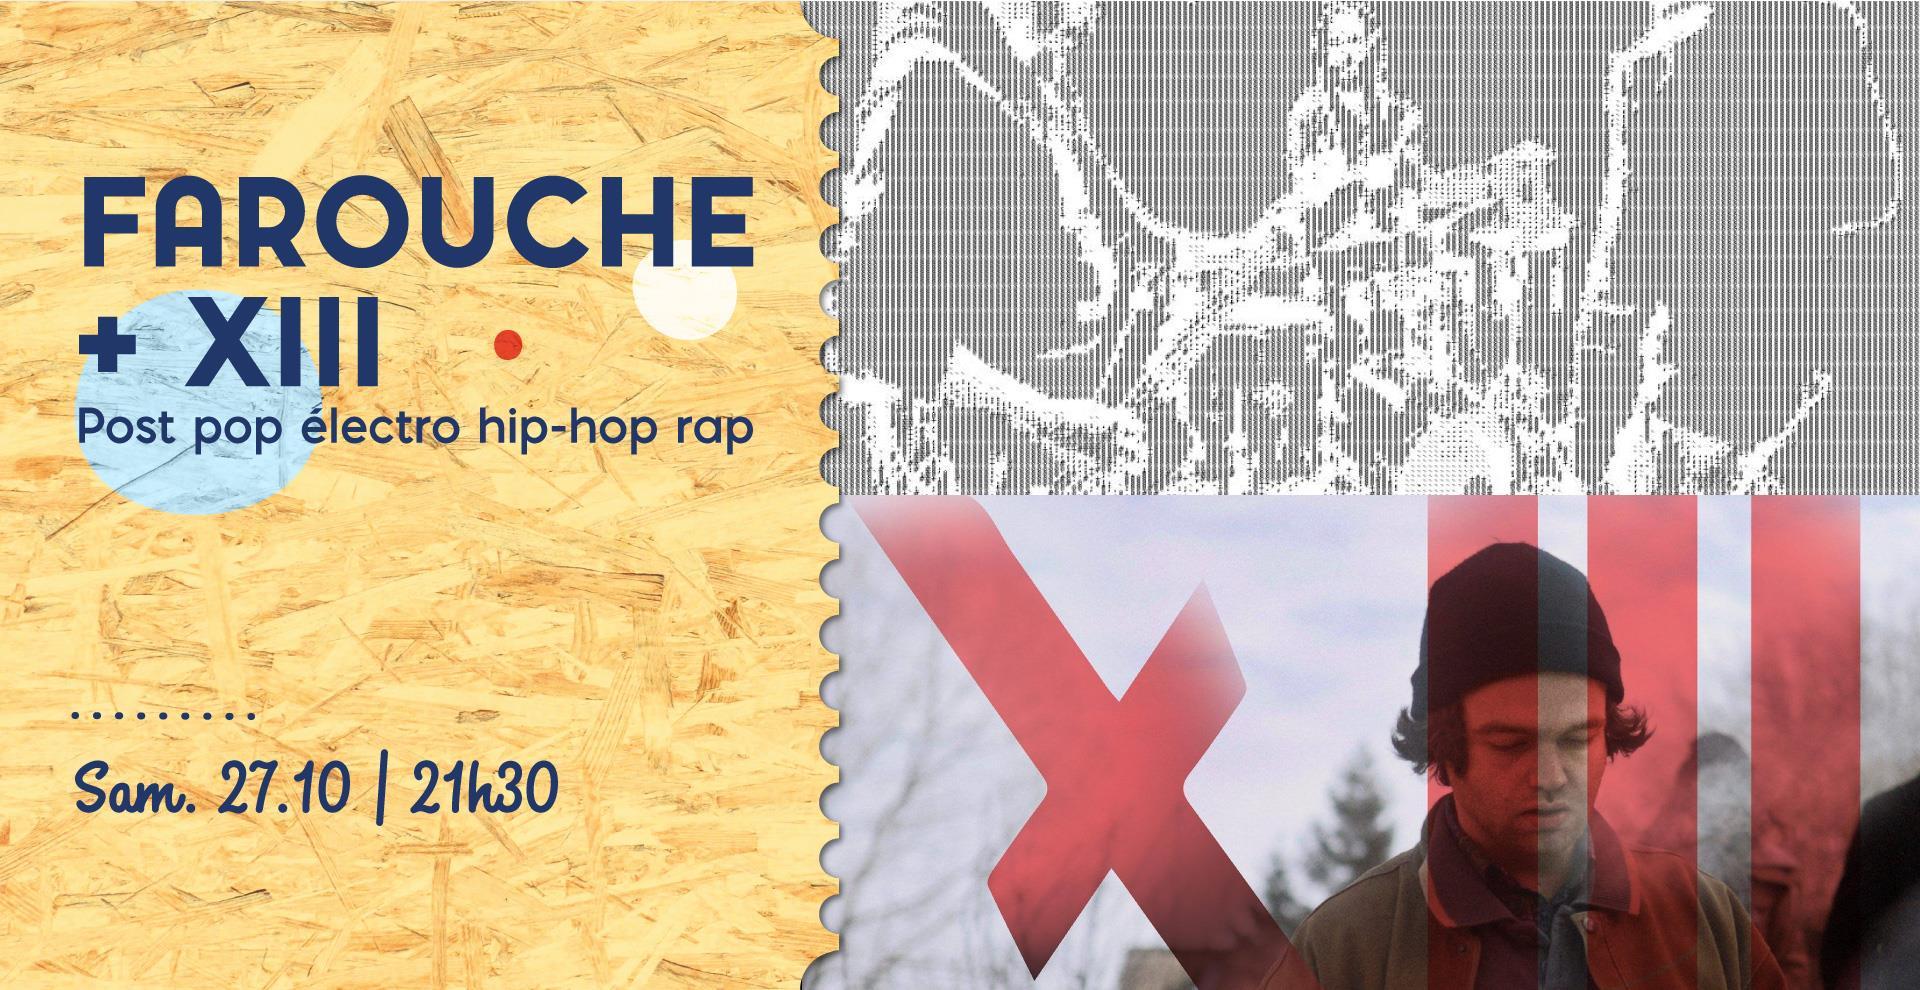 Farouche + XIII au Cirque